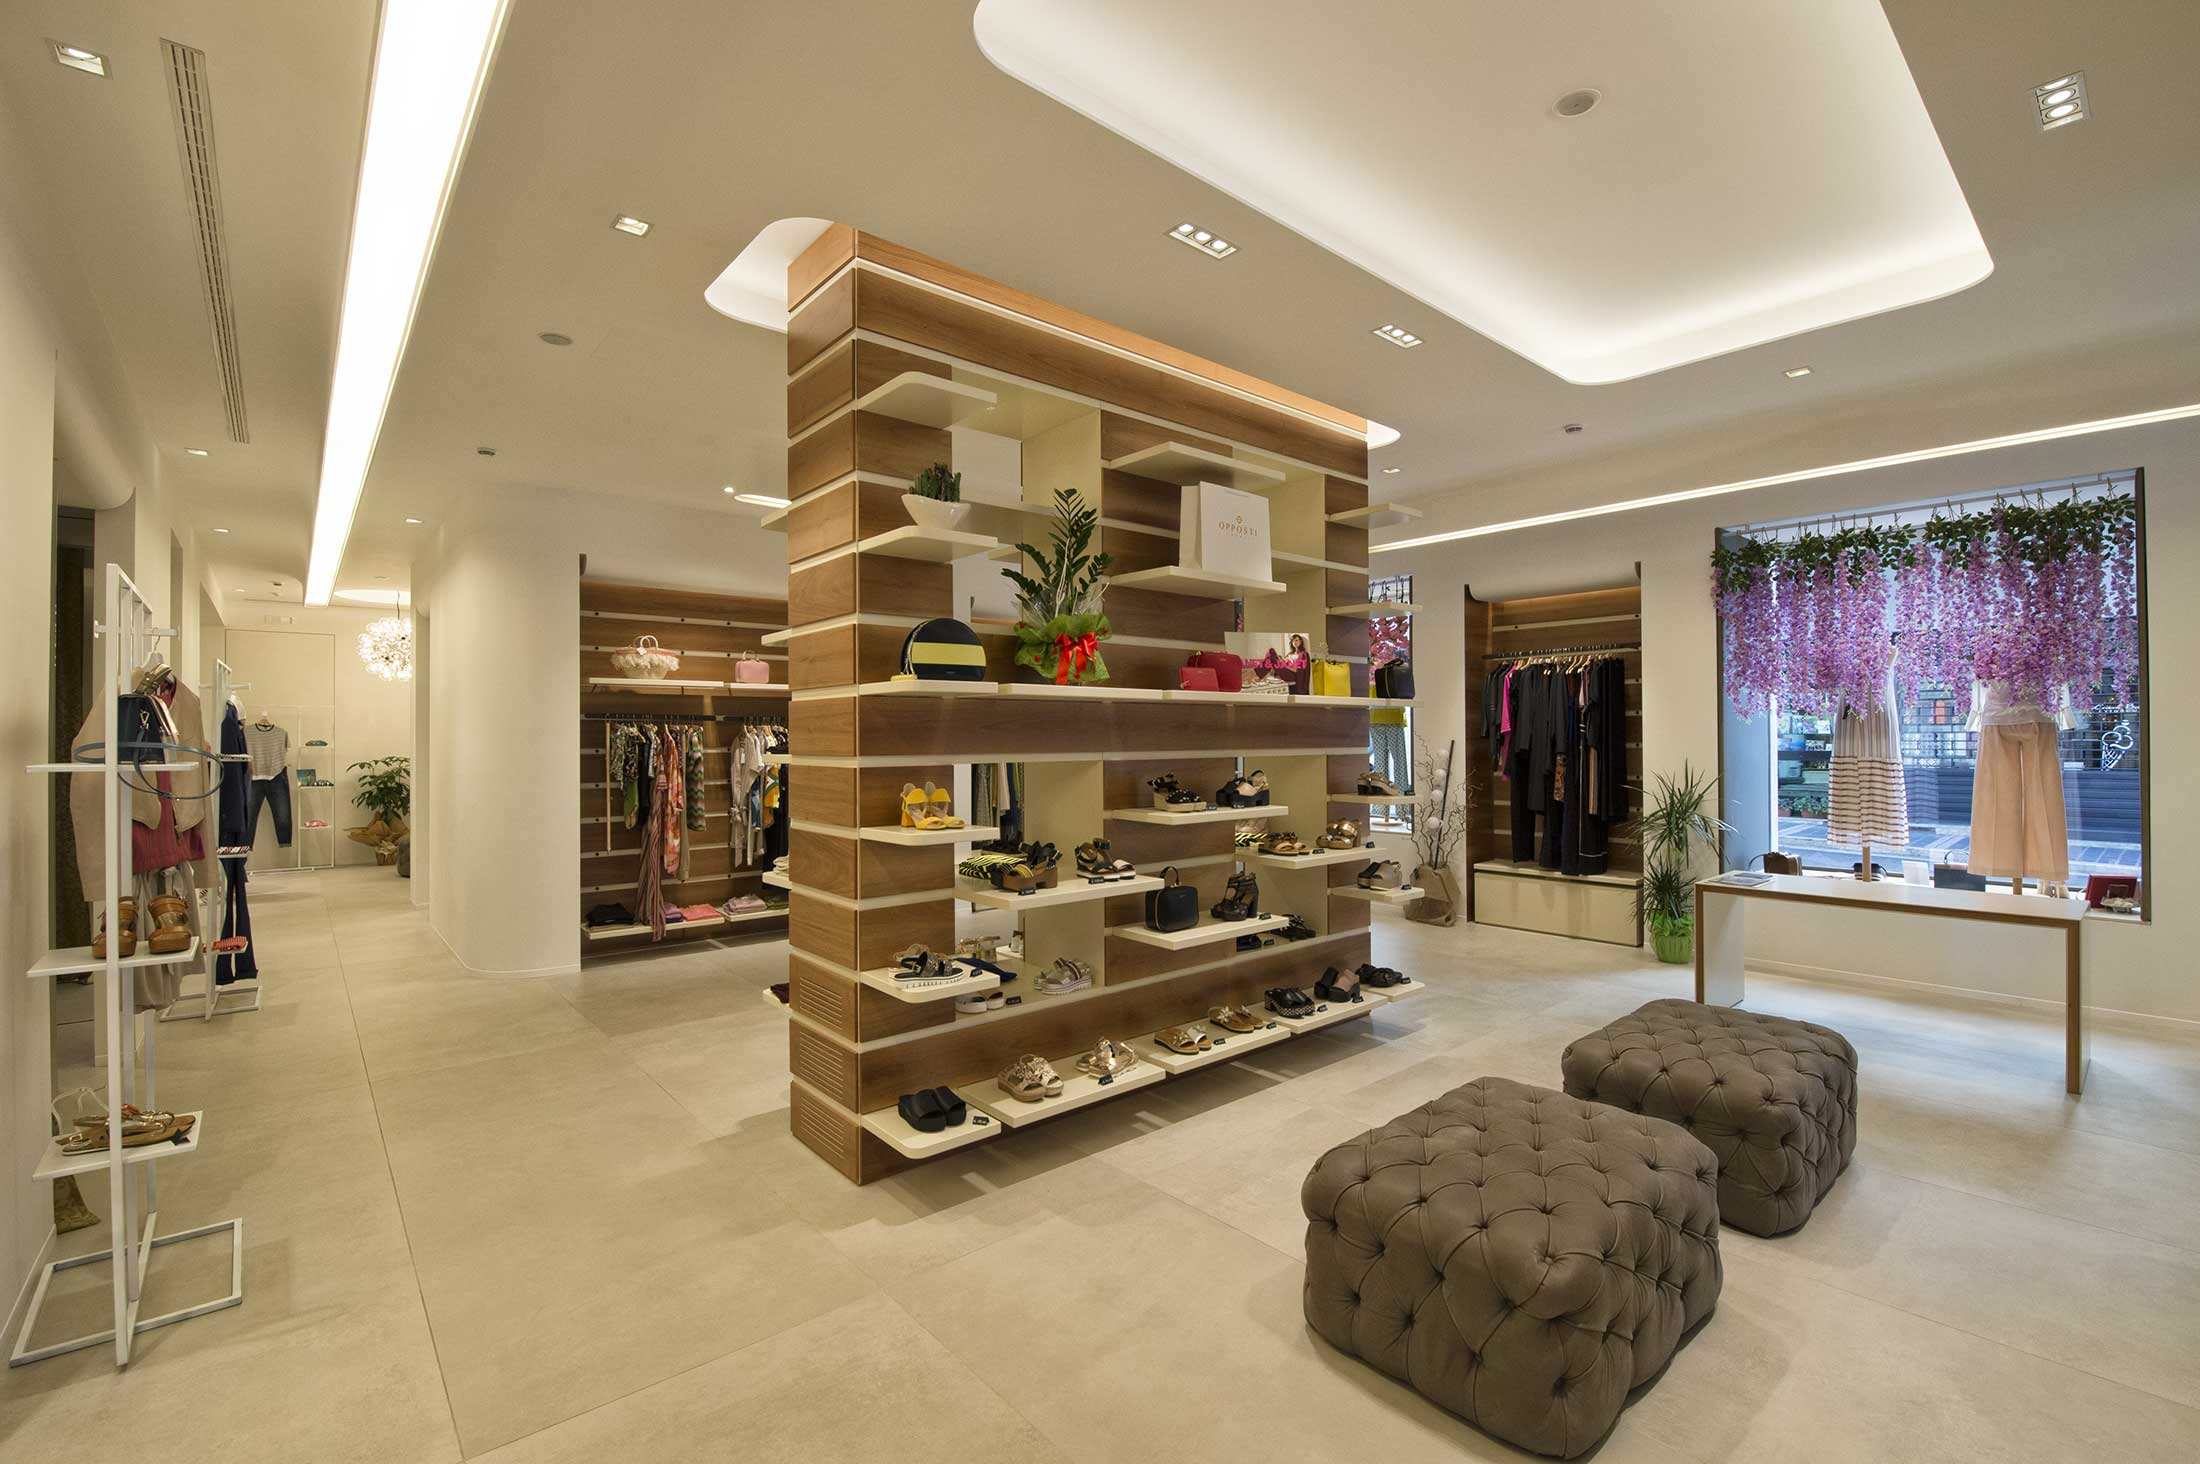 Opposti-Boutique-Addessi-Solutions (5)